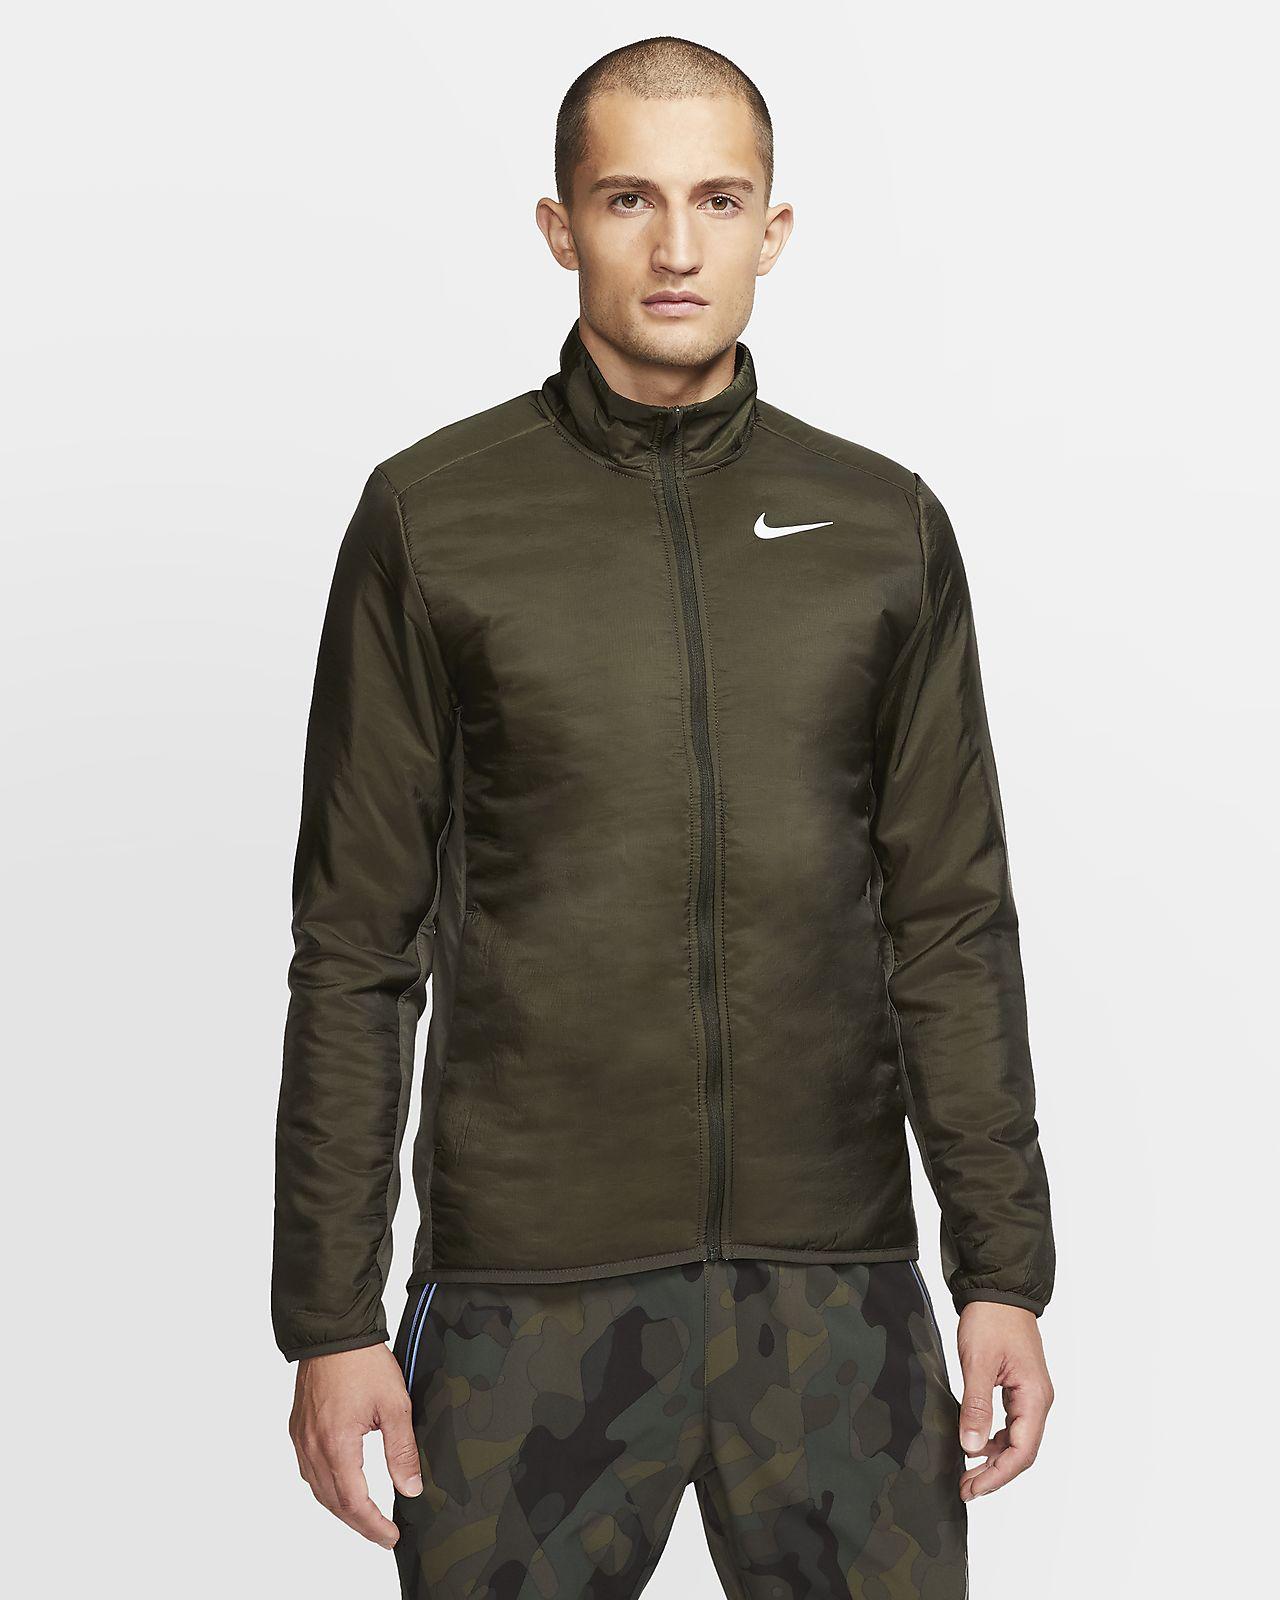 Herren Laufjacke AeroLayer Laufjacke Herren Nike AeroLayer Nike Nike FJK1lc